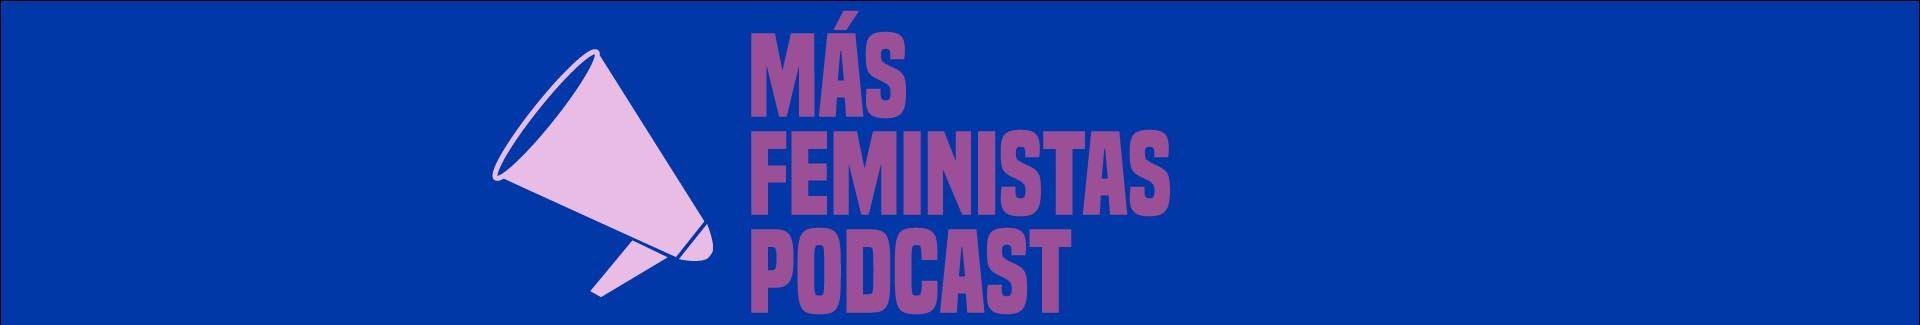 banner-mas-feministas-2020